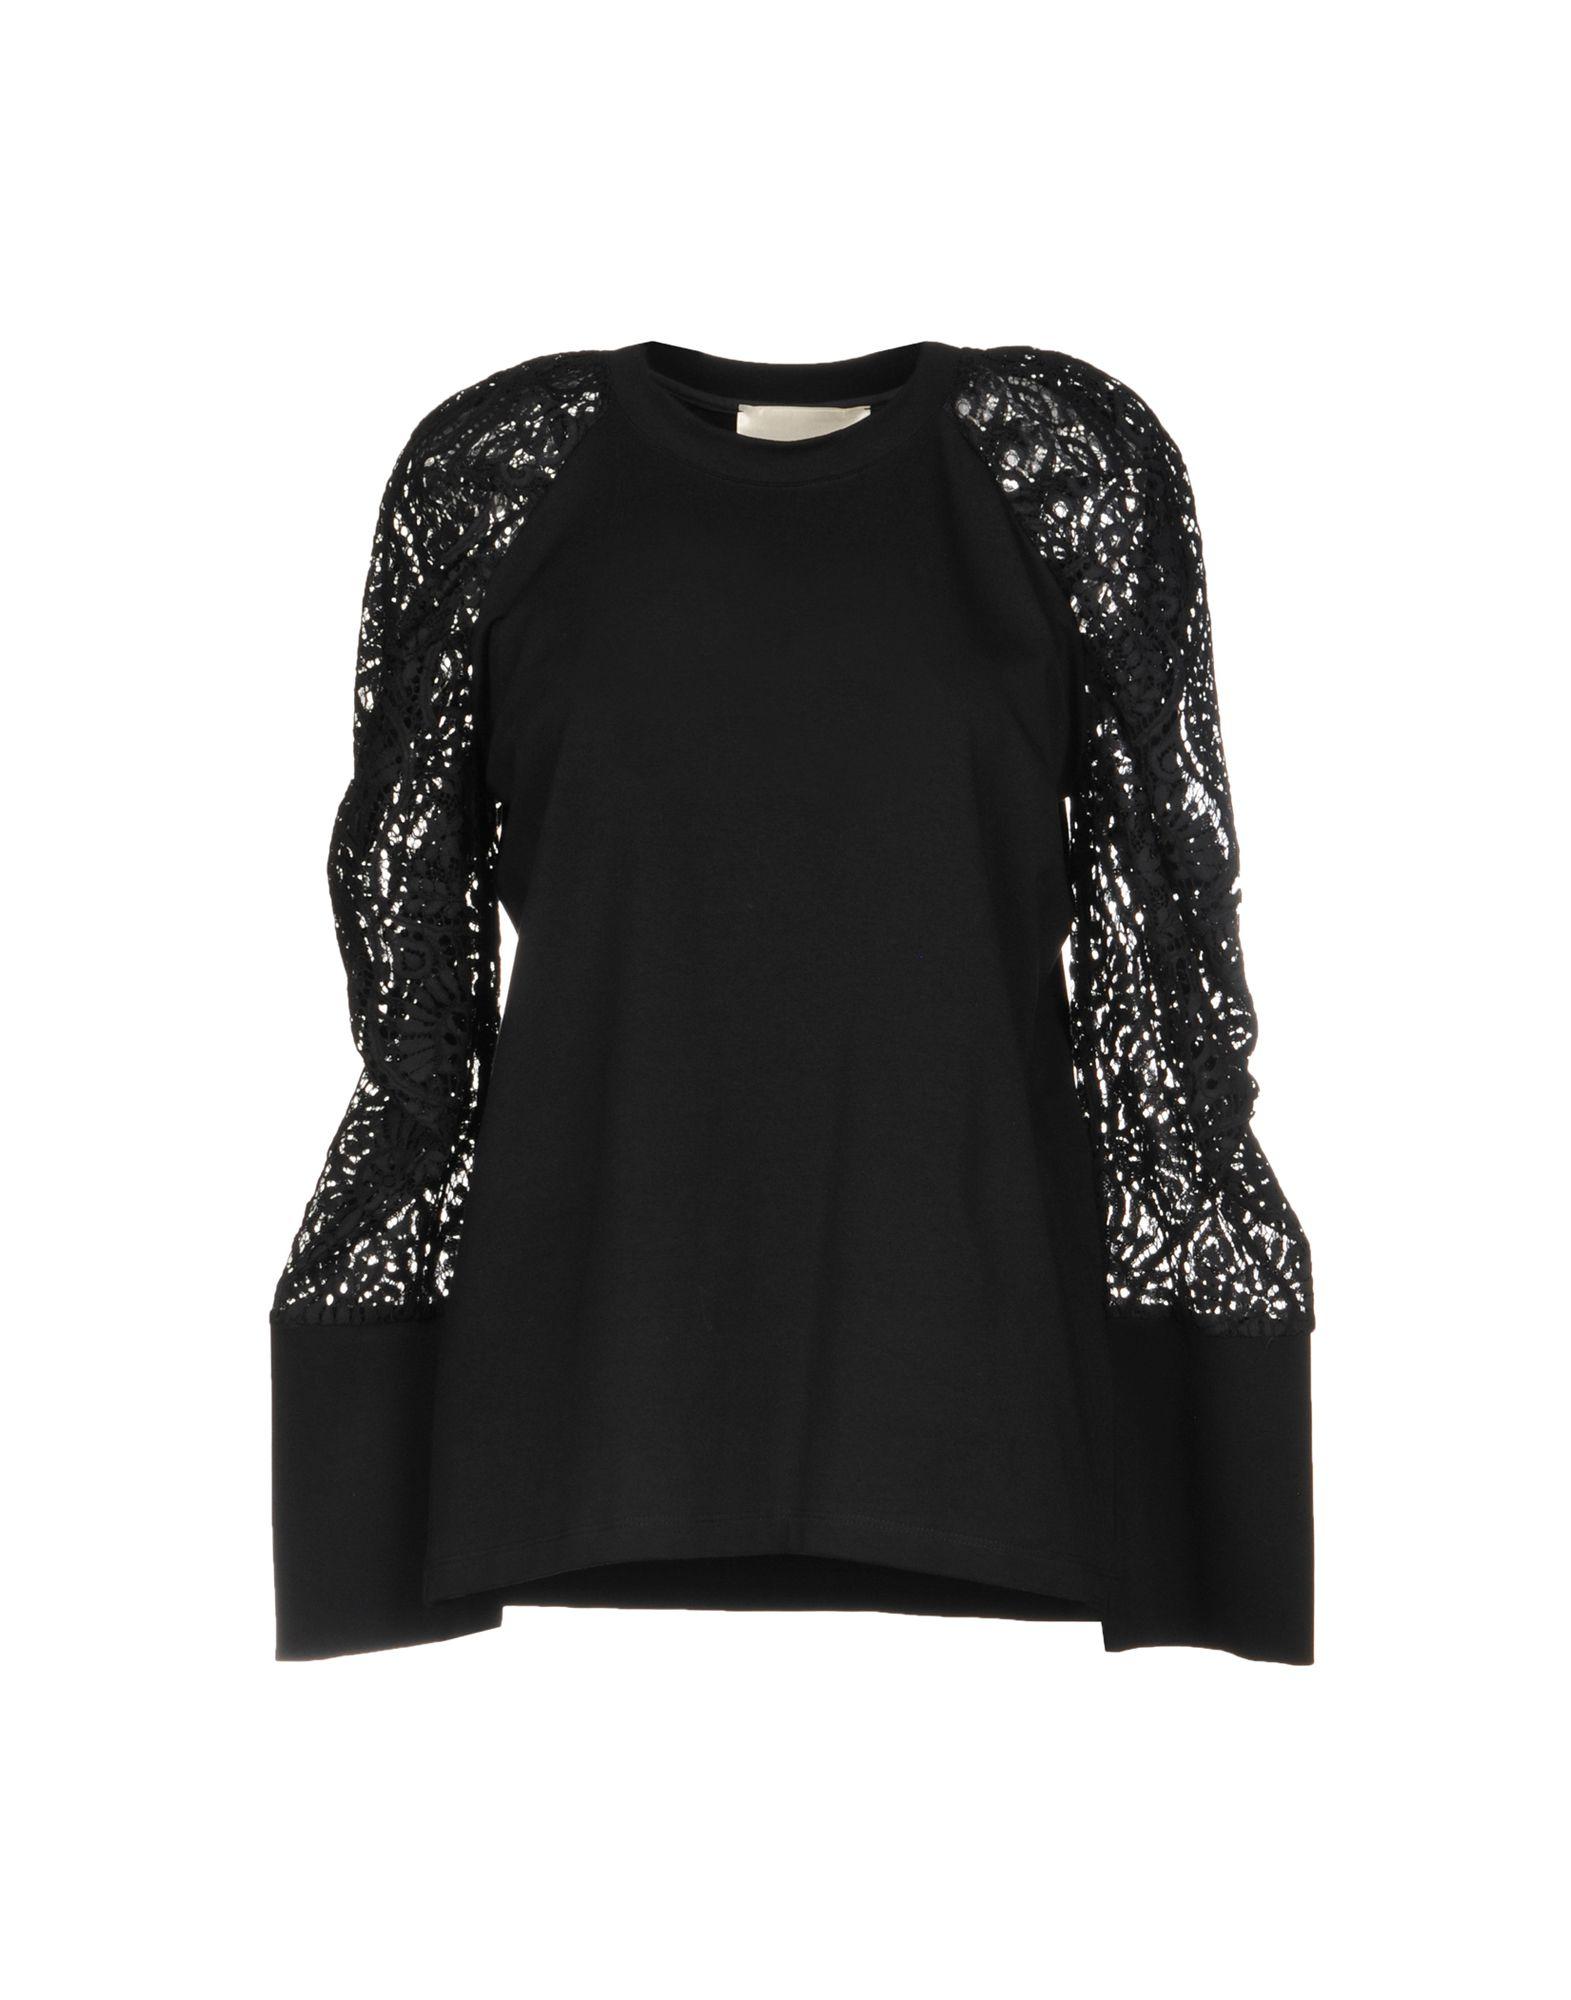 TILL.DA Sweatshirt in Black